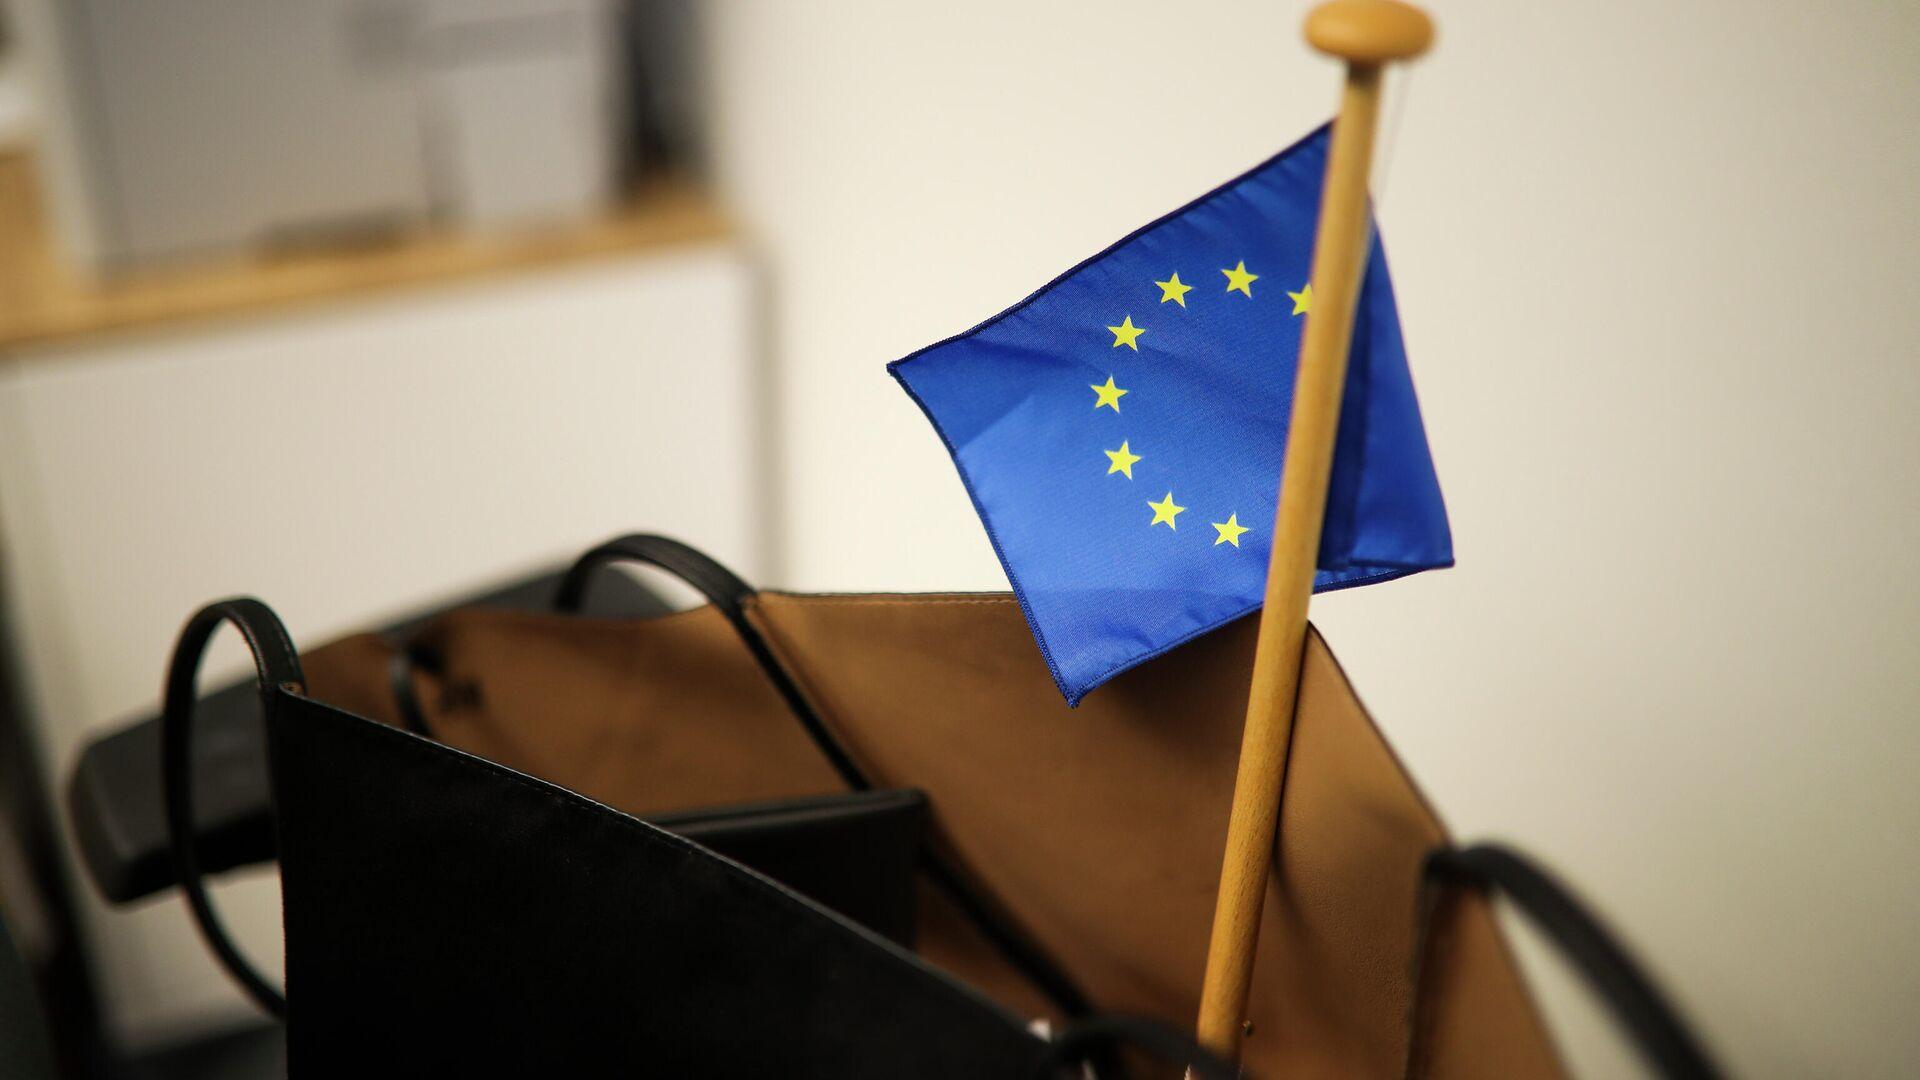 Сумка с флажком ЕС в здании Европейского парламента в брюсселе - РИА Новости, 1920, 20.09.2021